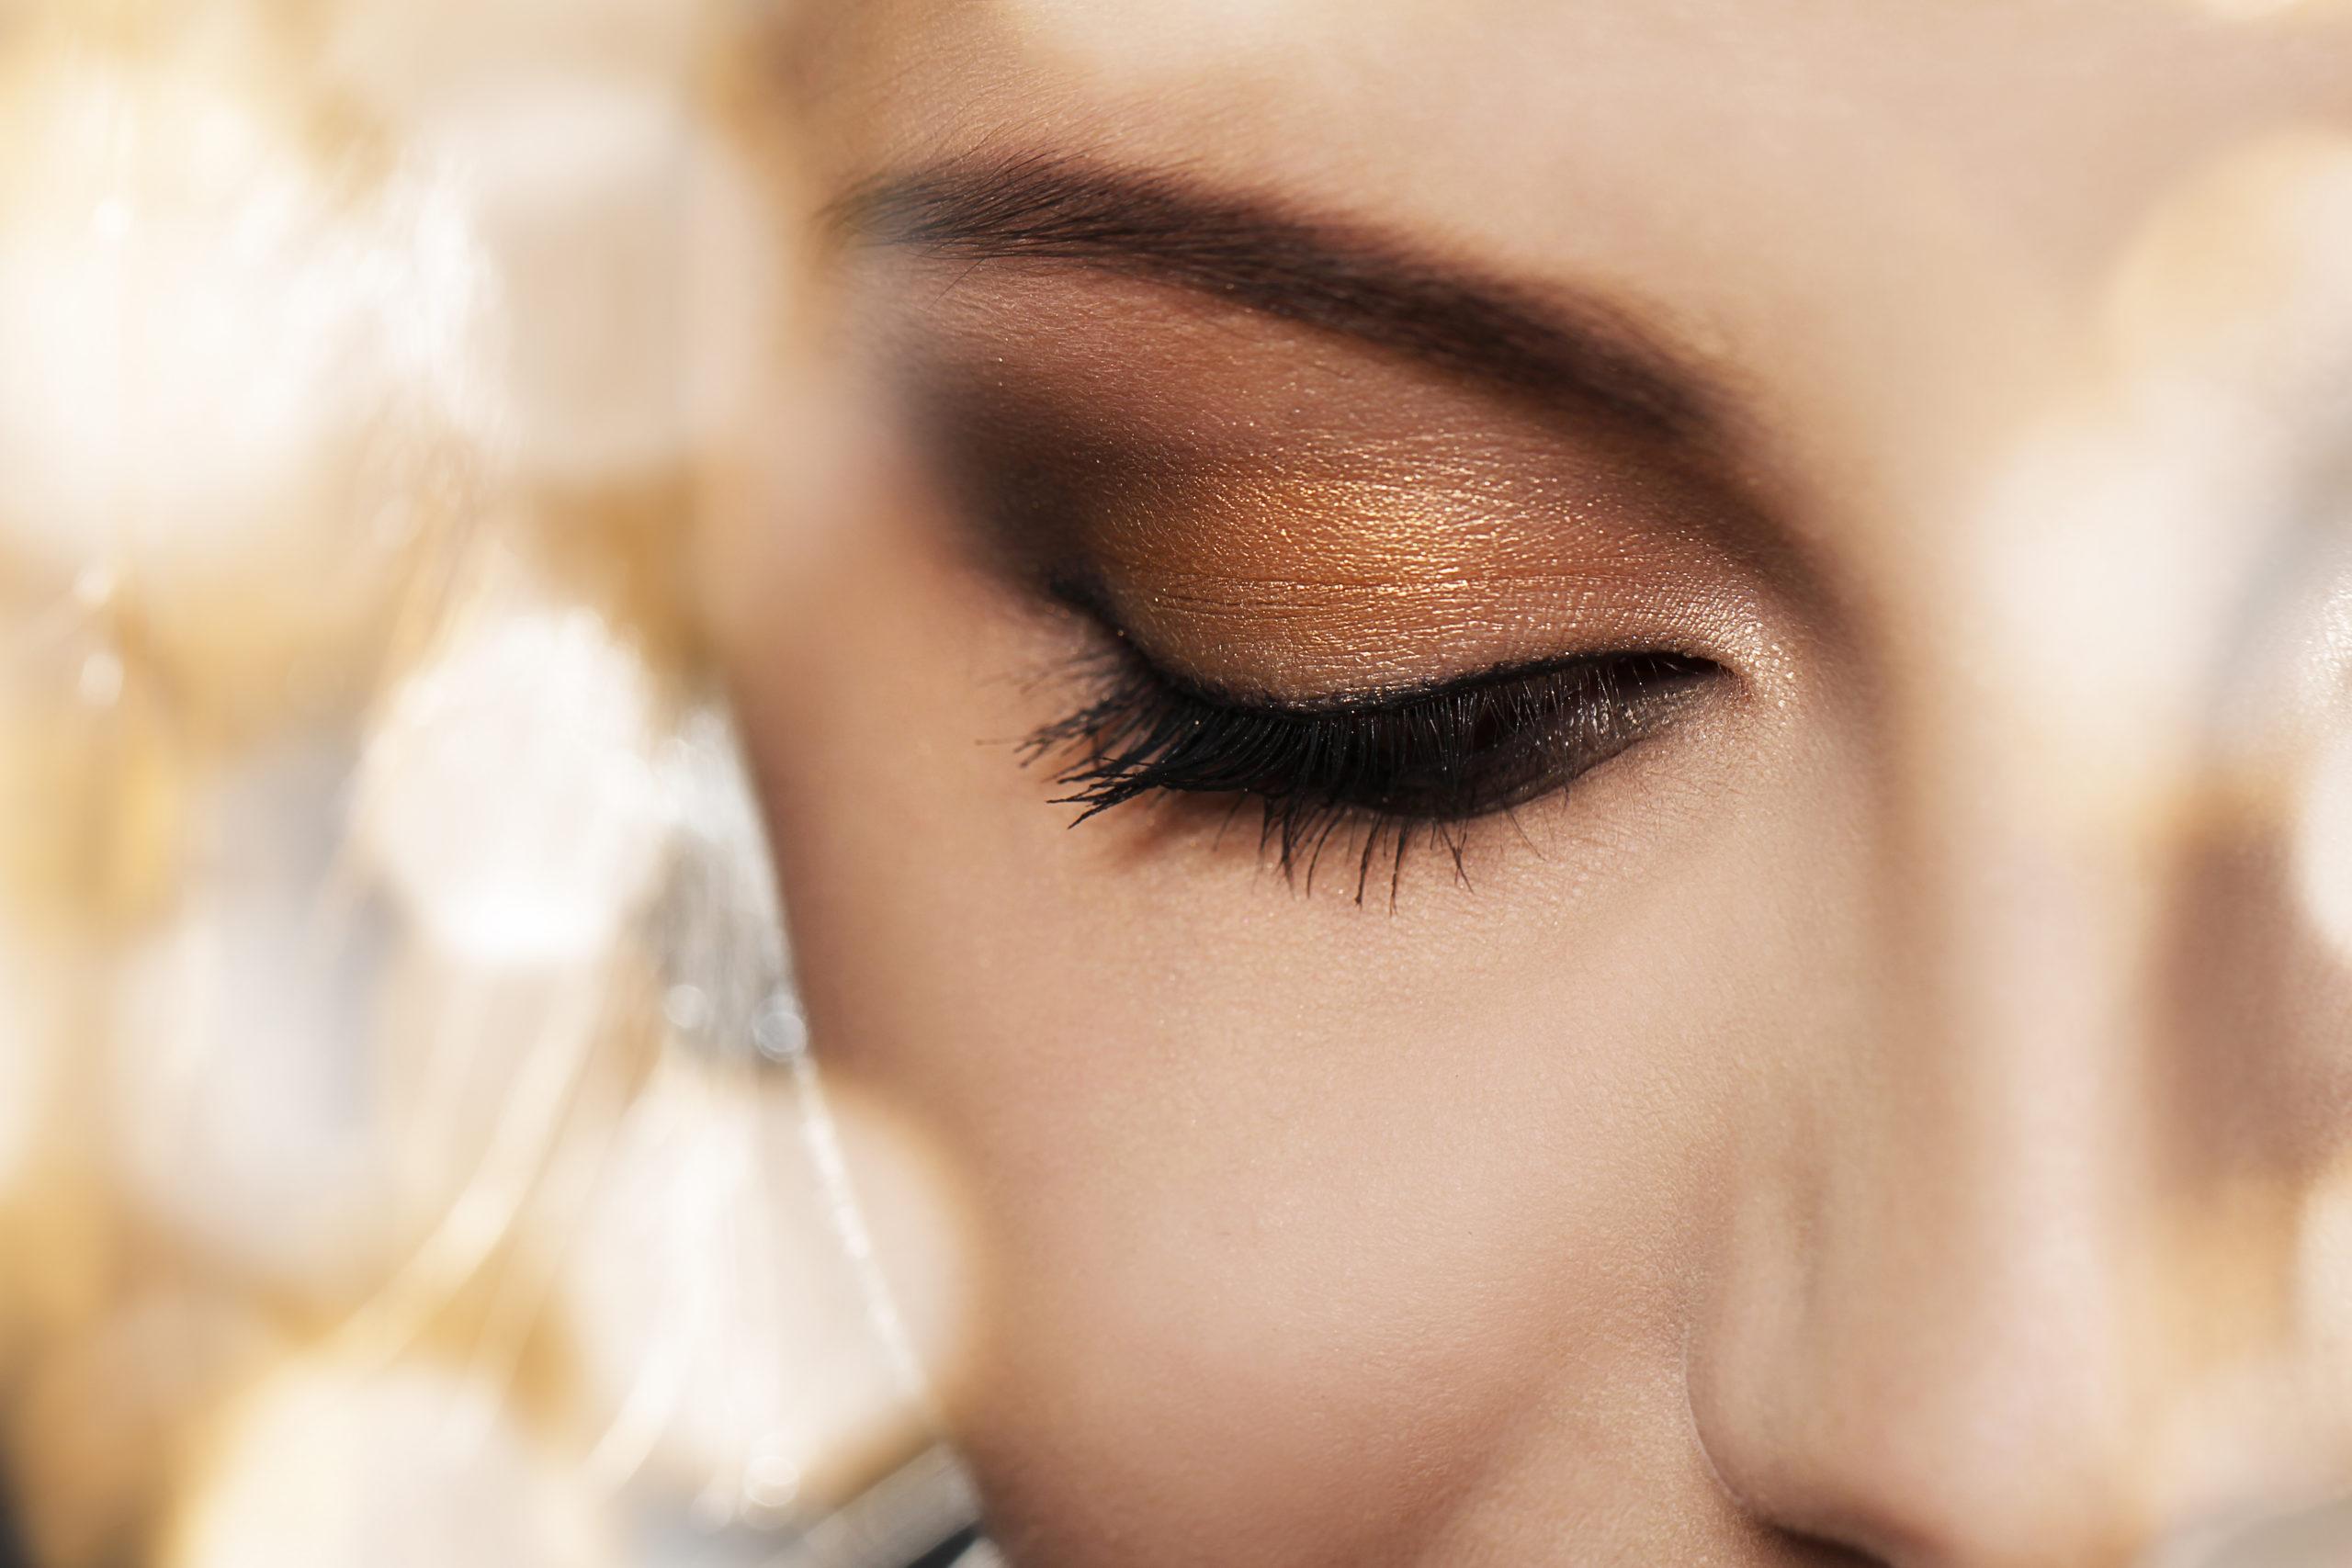 Close up of woman face with eye makeup